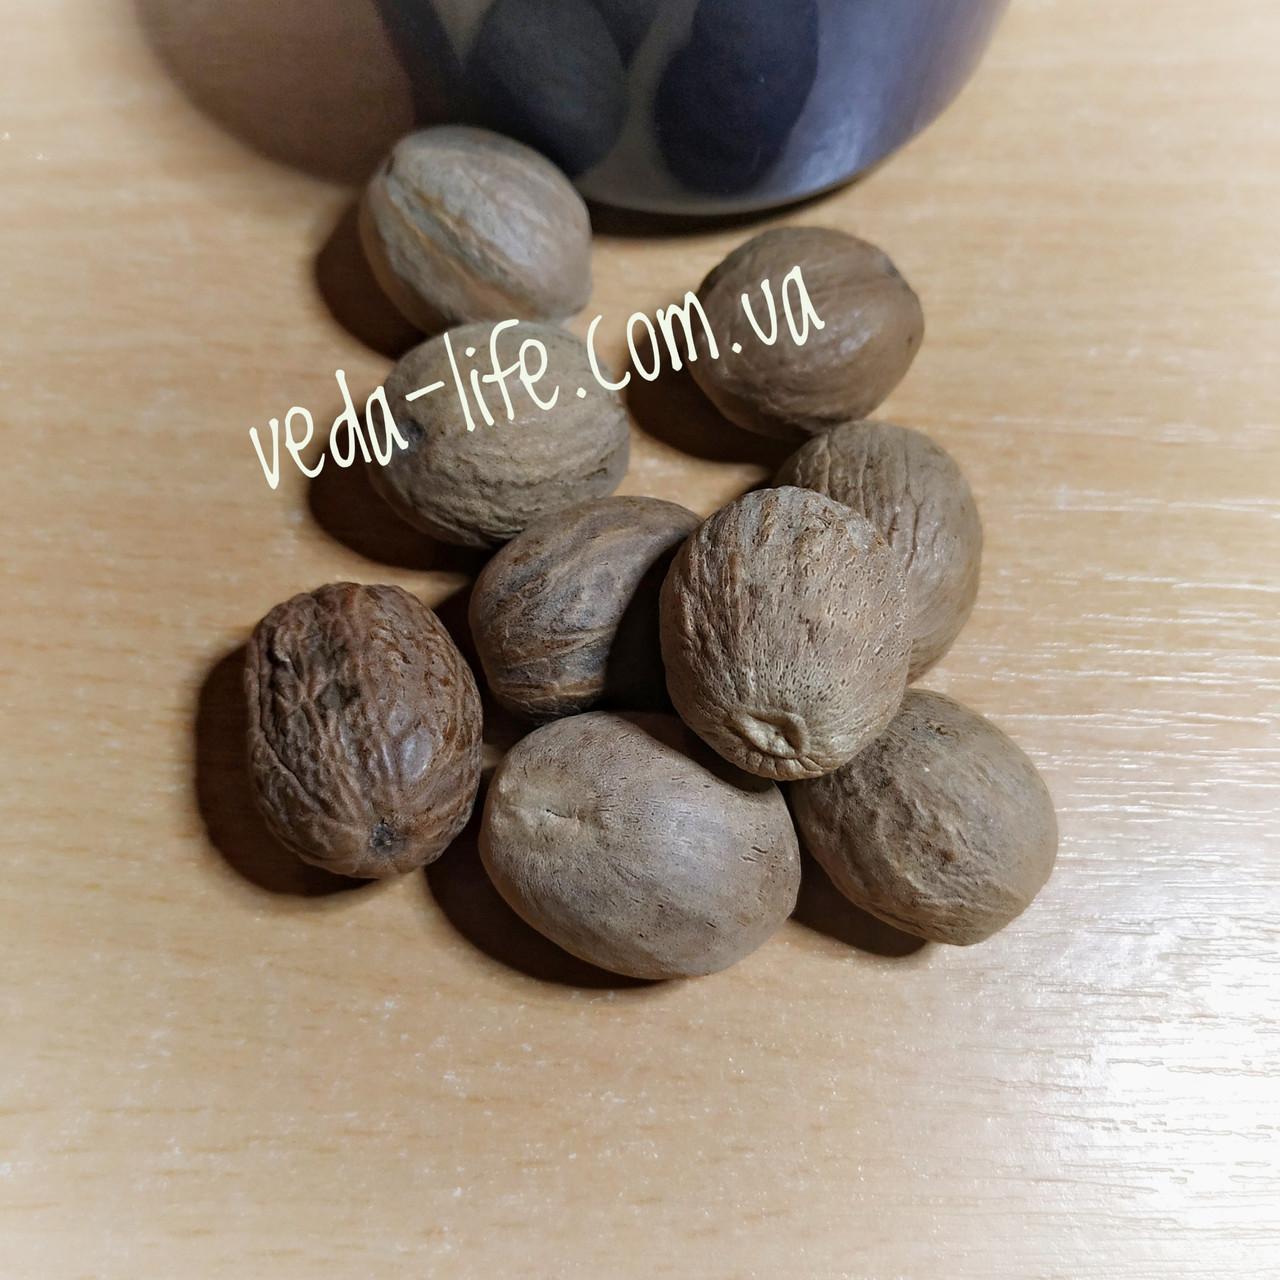 Мускатний горіх великий. Мускатный орех крупный. Орех мускатный отборный. 1 шт. 6-8 грам